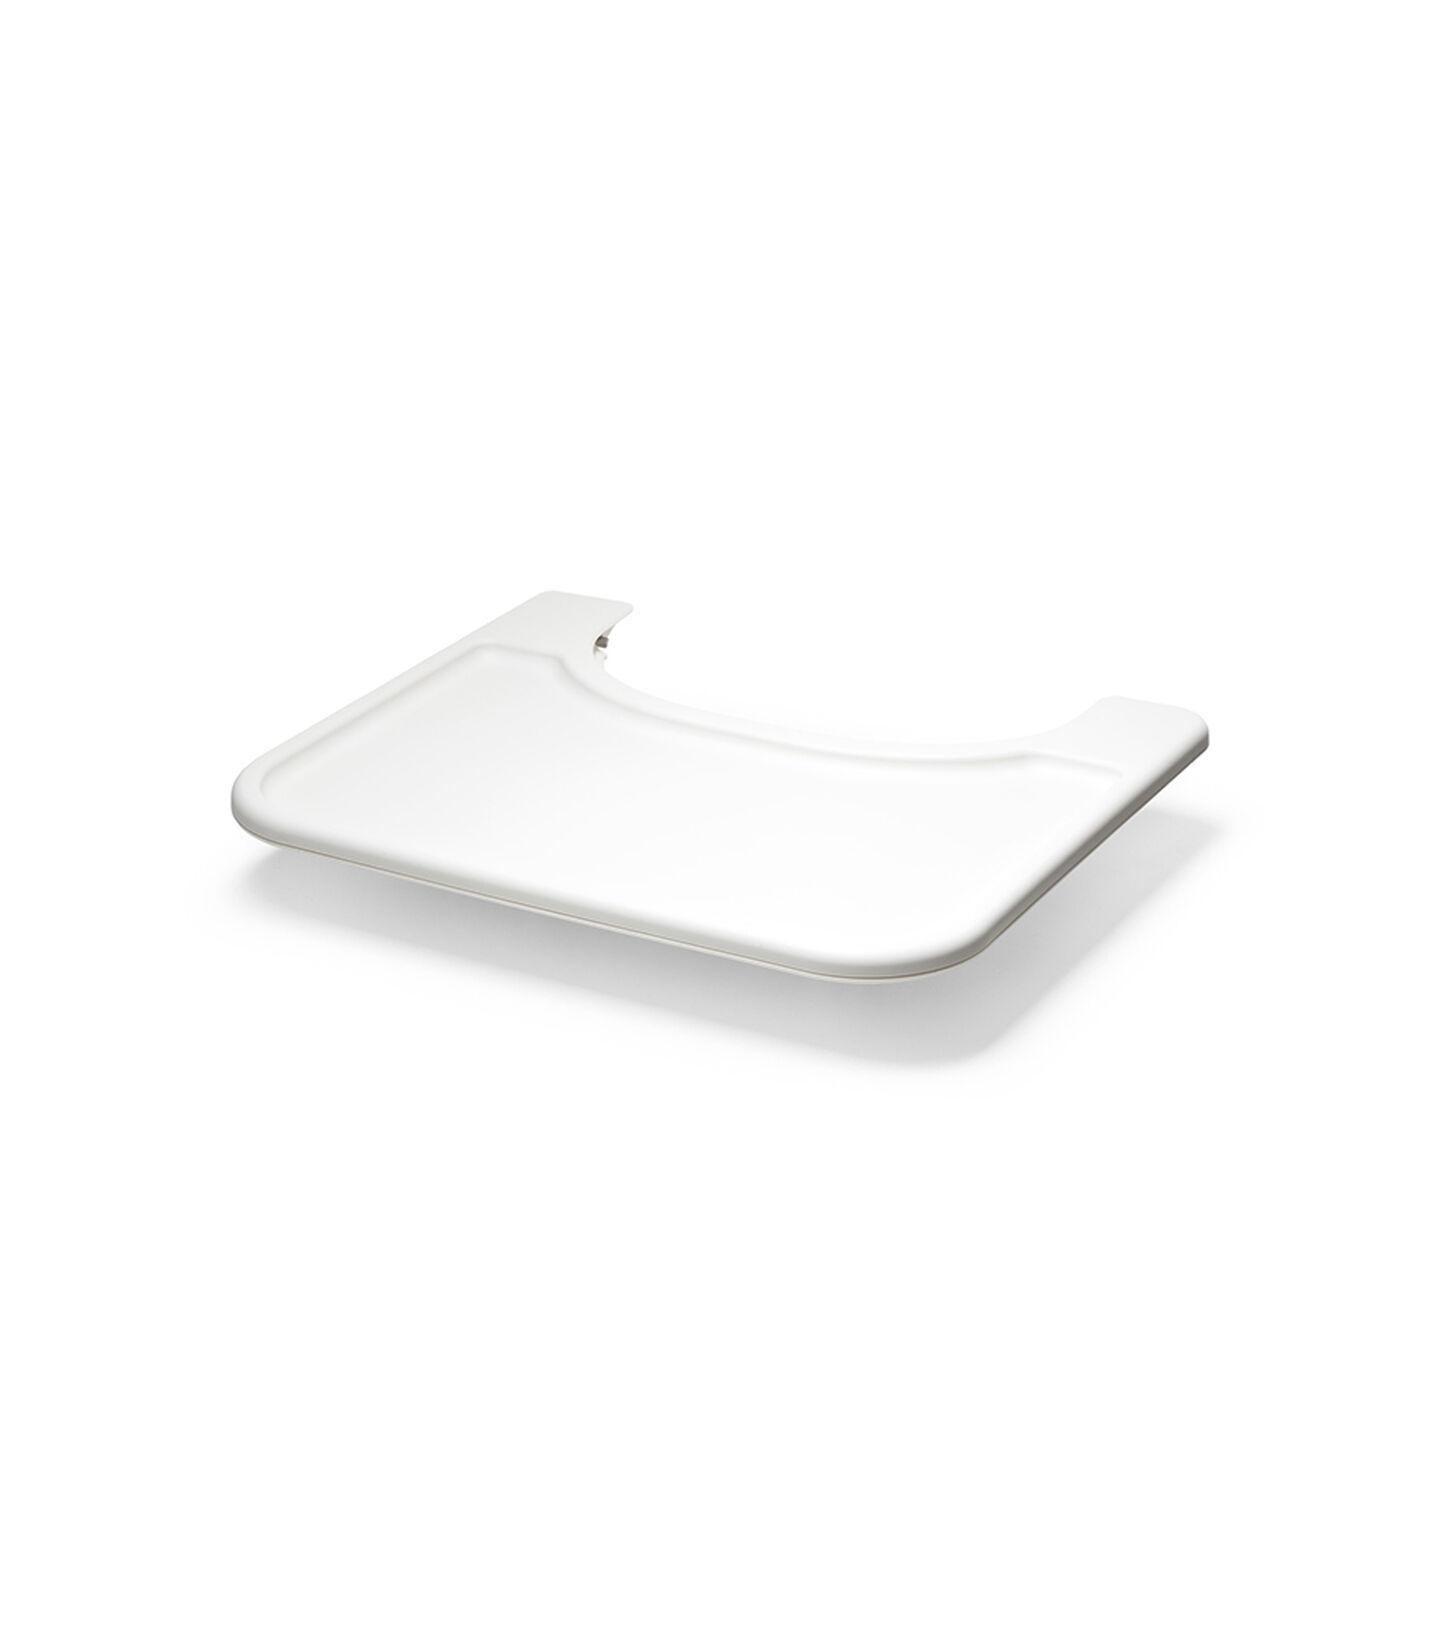 Stokke® Steps™ Baby Set con vassoio Bianco, Bianco, mainview view 1